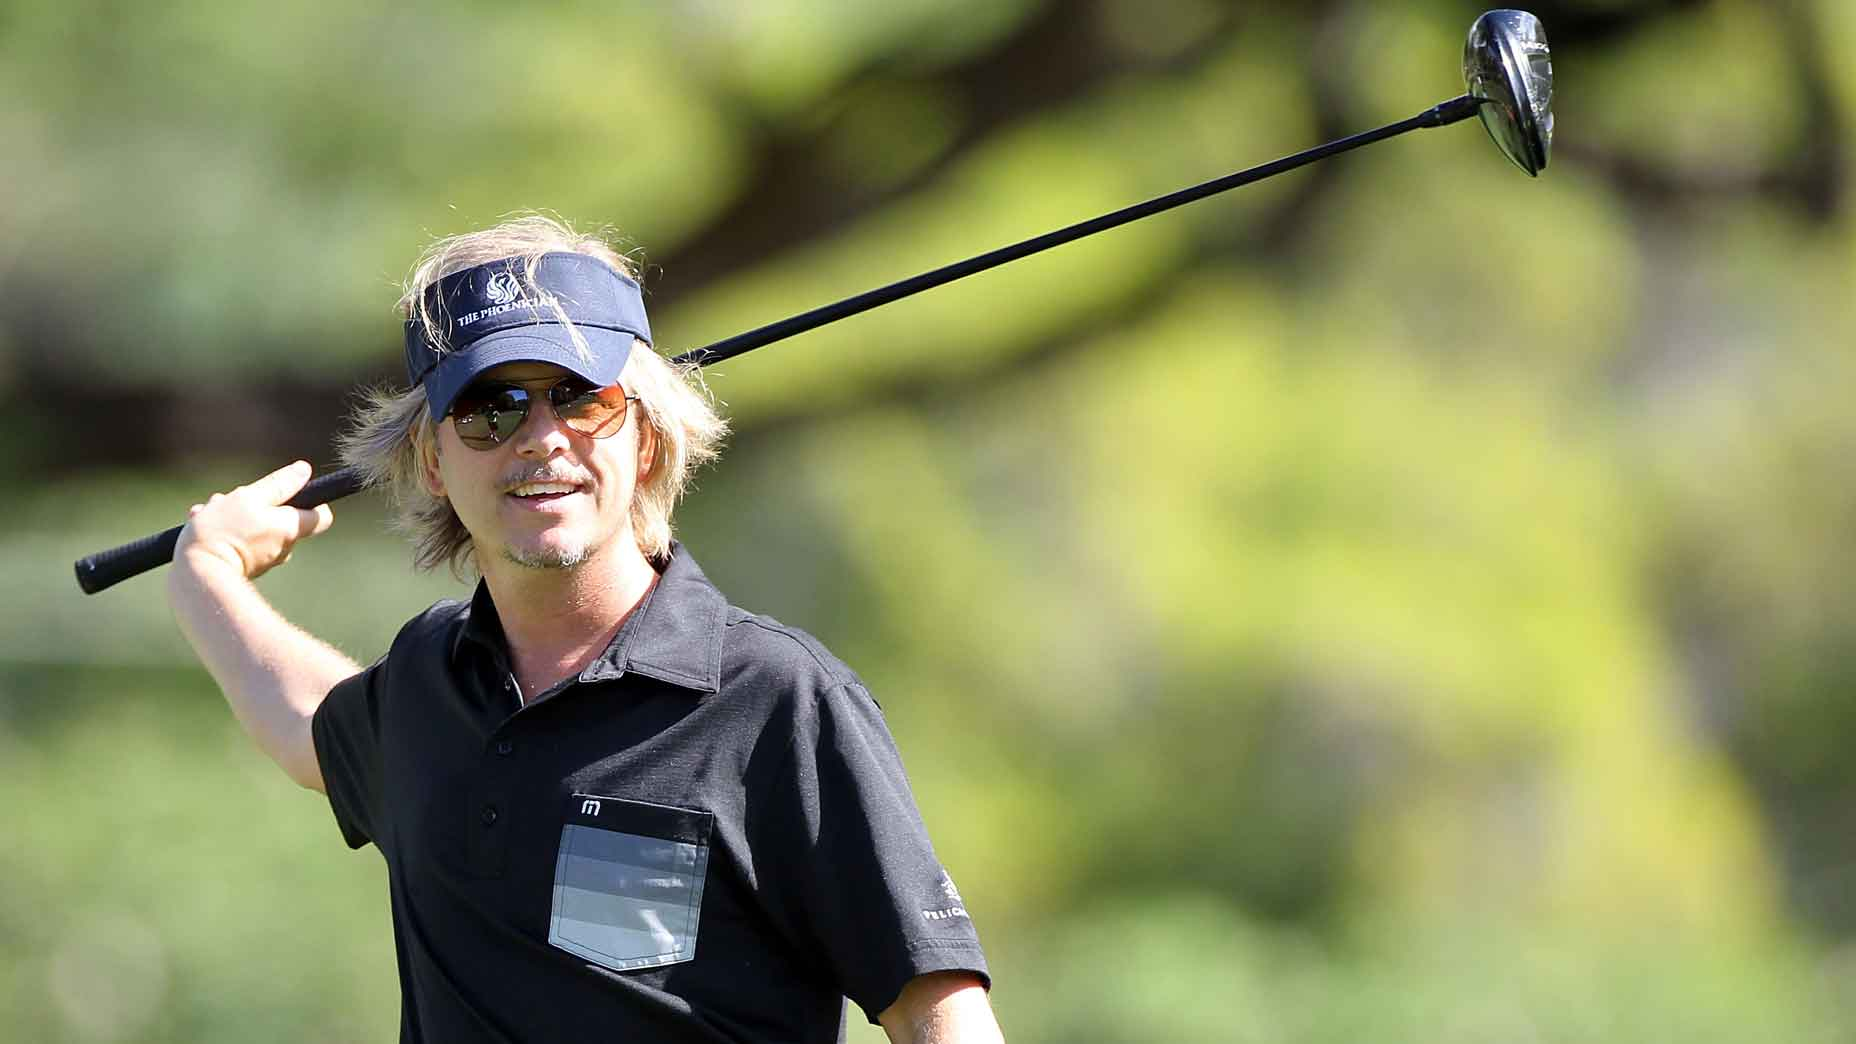 David Spade golf